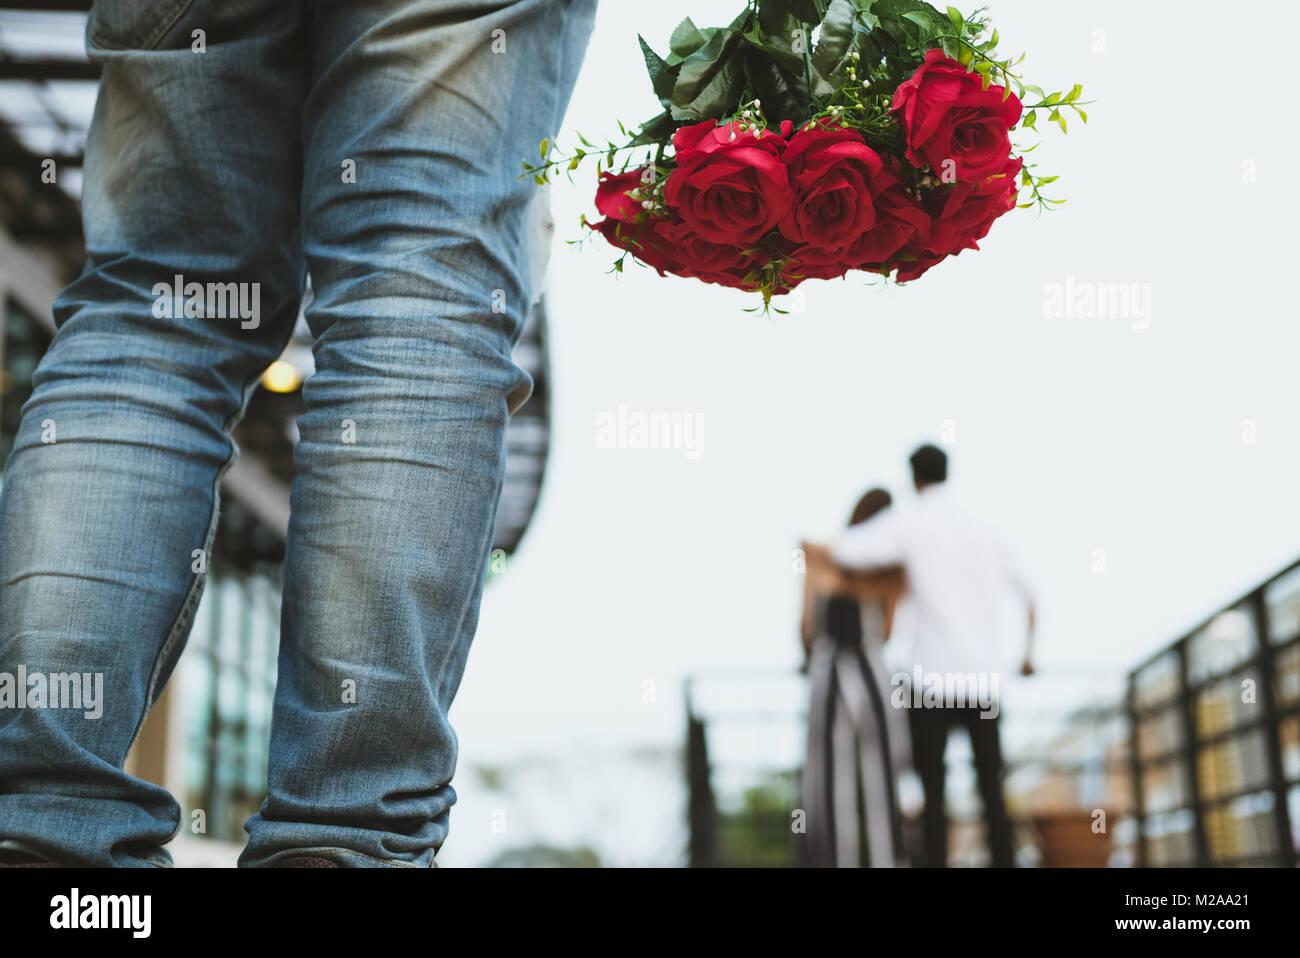 Giornale di settore dating online